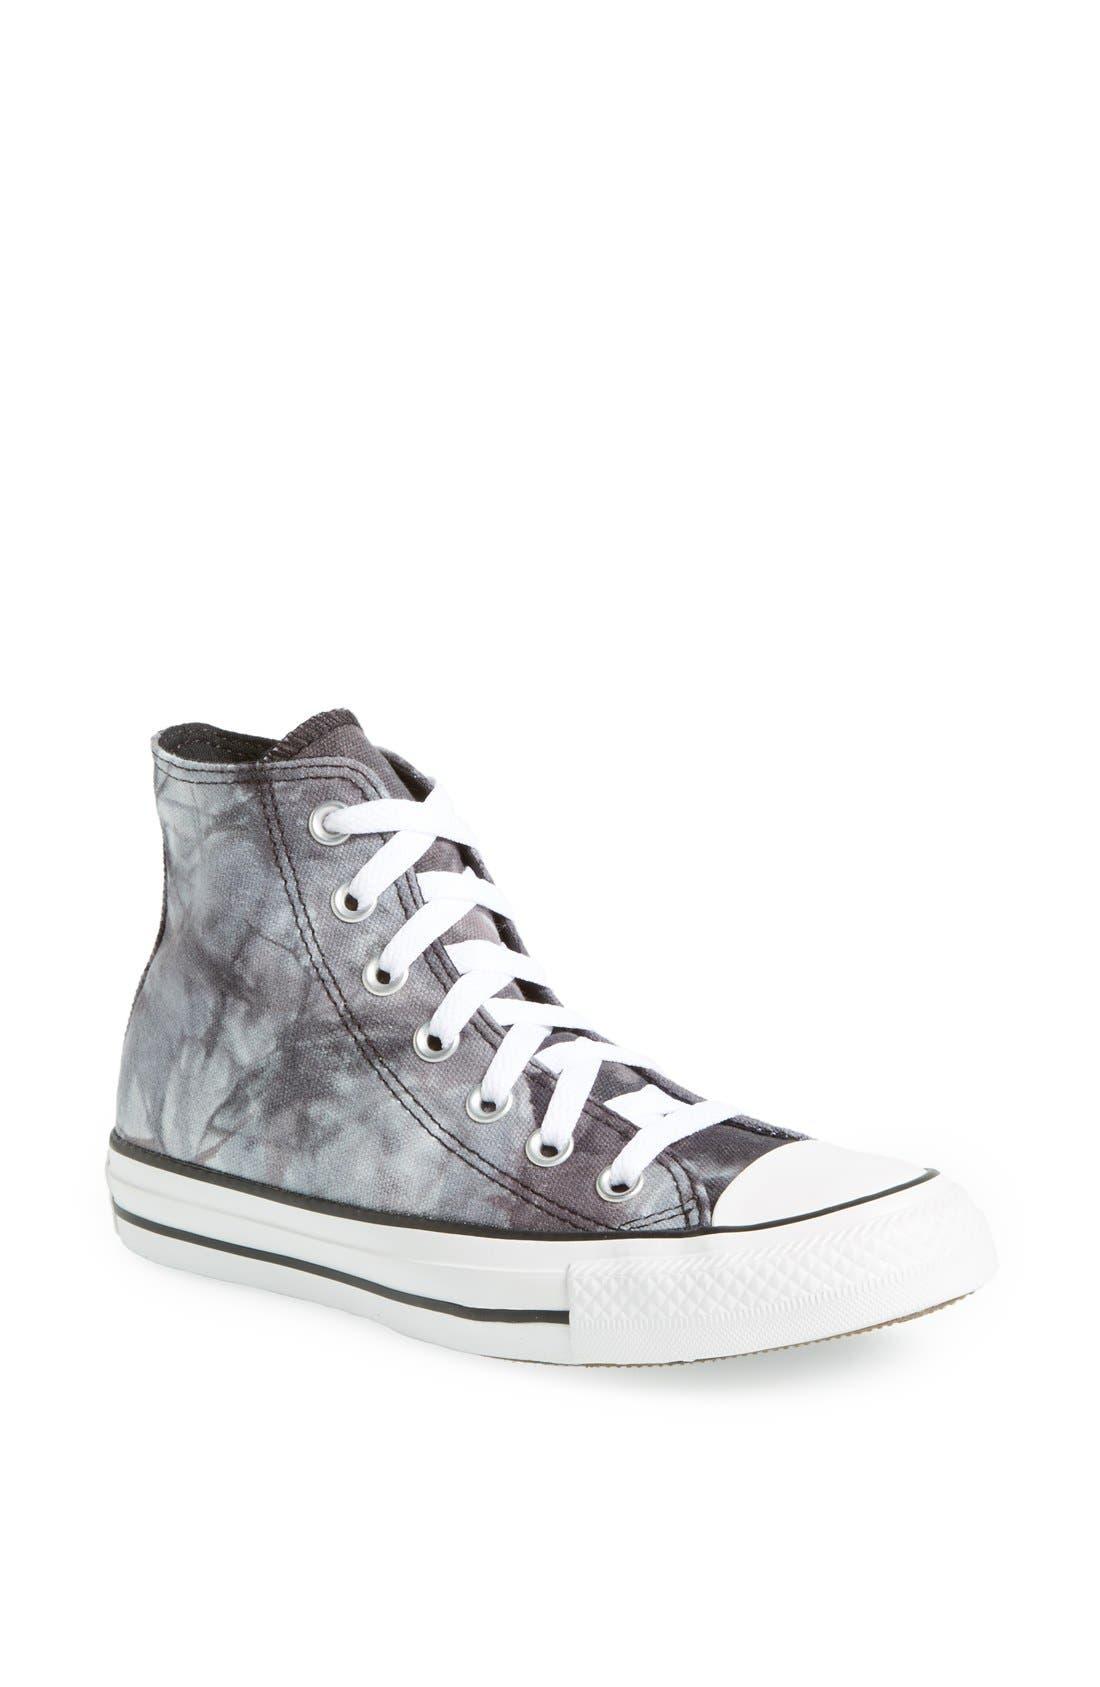 Alternate Image 1 Selected - Converse Chuck Taylor® All Star® 'Tie Dye' High Top Sneaker (Women)